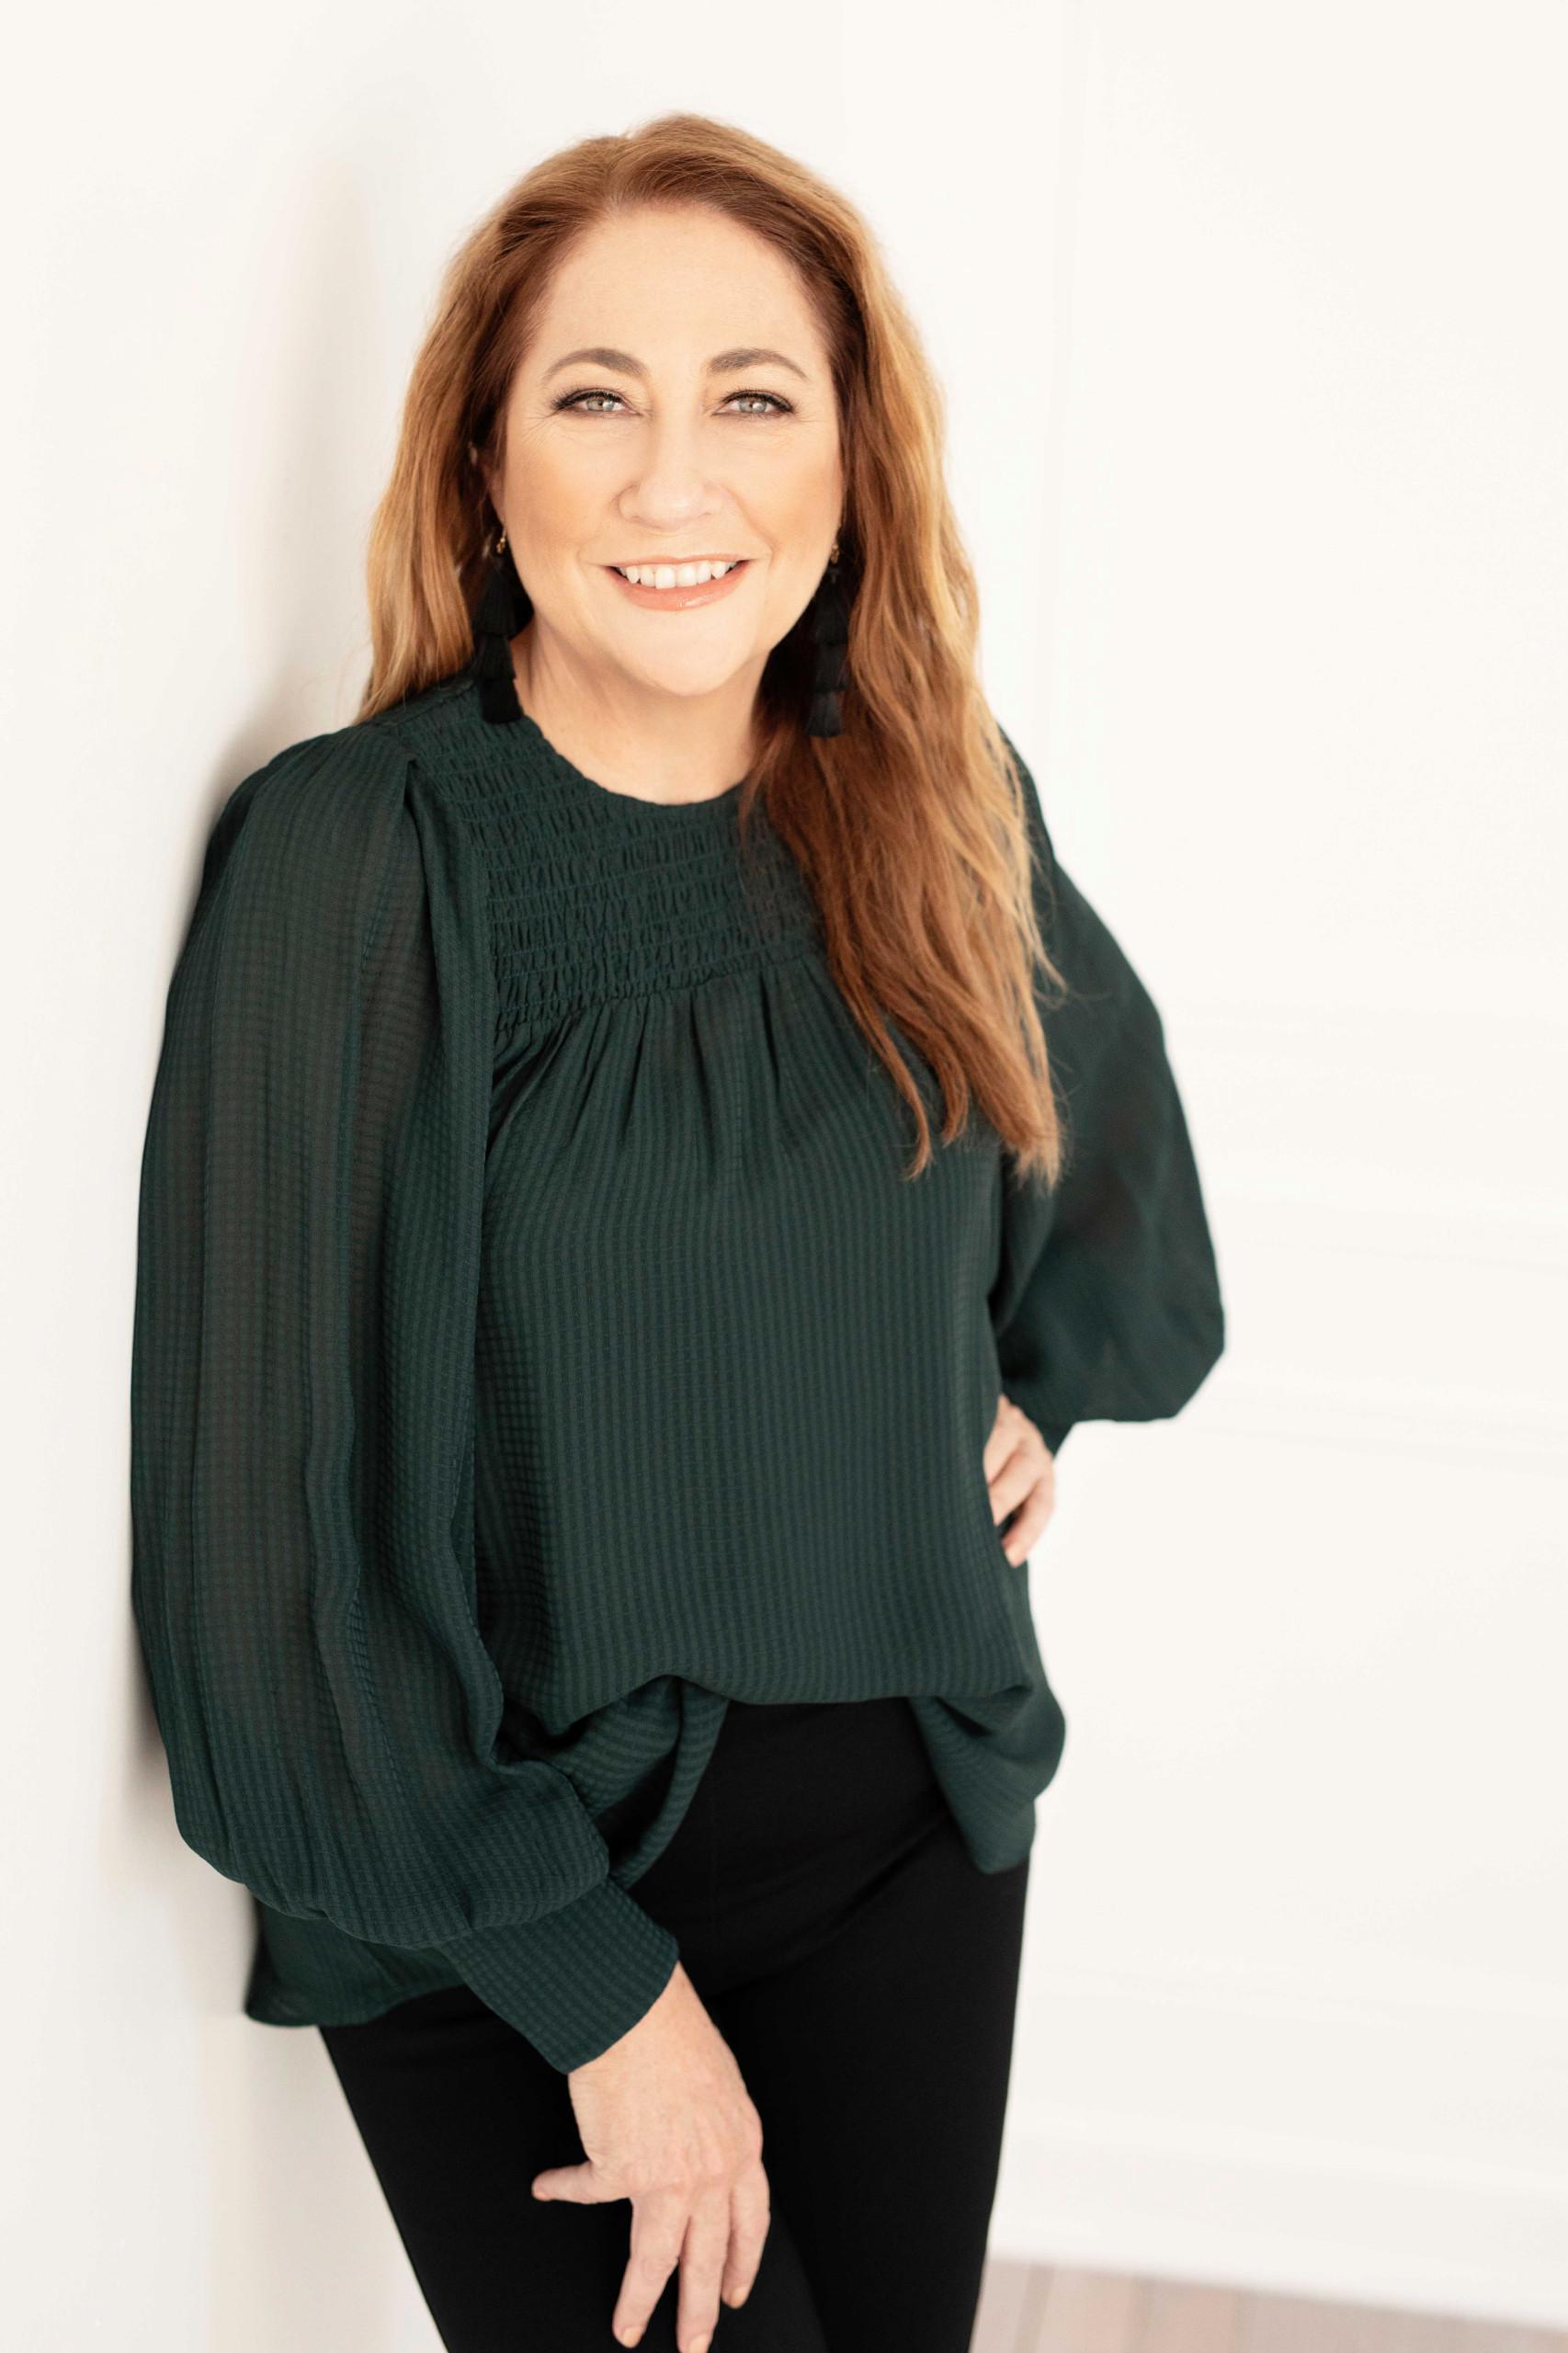 Sandra Dara - Interior Designer & Owner of New Leaf Design Studios